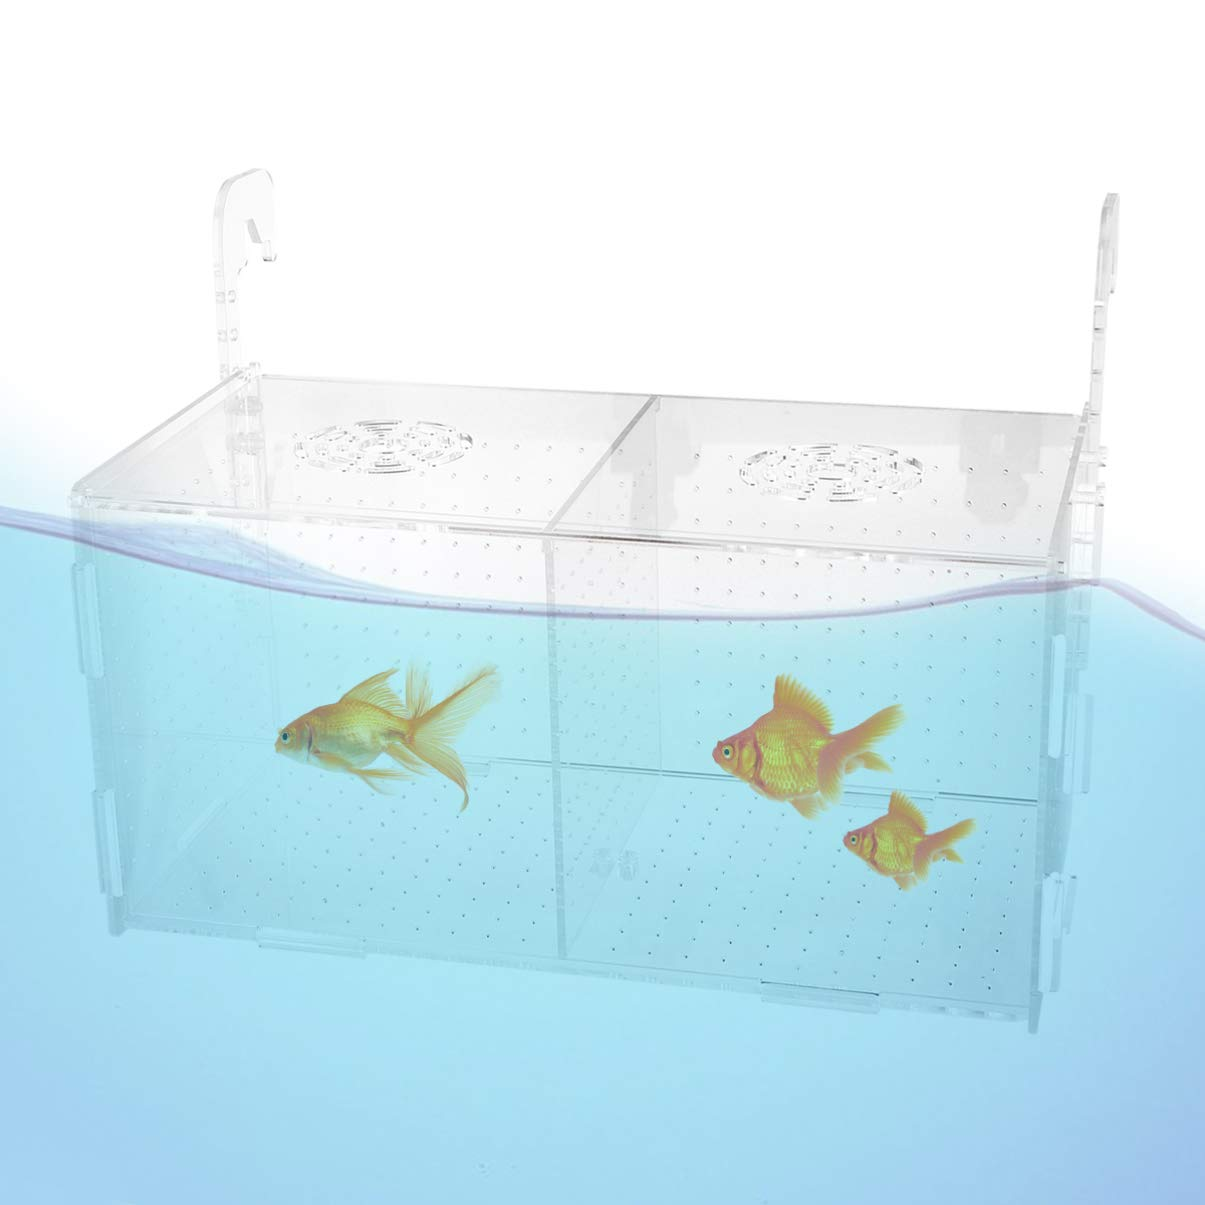 POPETPOP Fish Tank Breeding Isolation Box Aquarium Incubator Hatching Boxes Parenting Box Multifunctional Acrylic Fish Tank Holder 301516cm (Hook Pattern) by POPETPOP